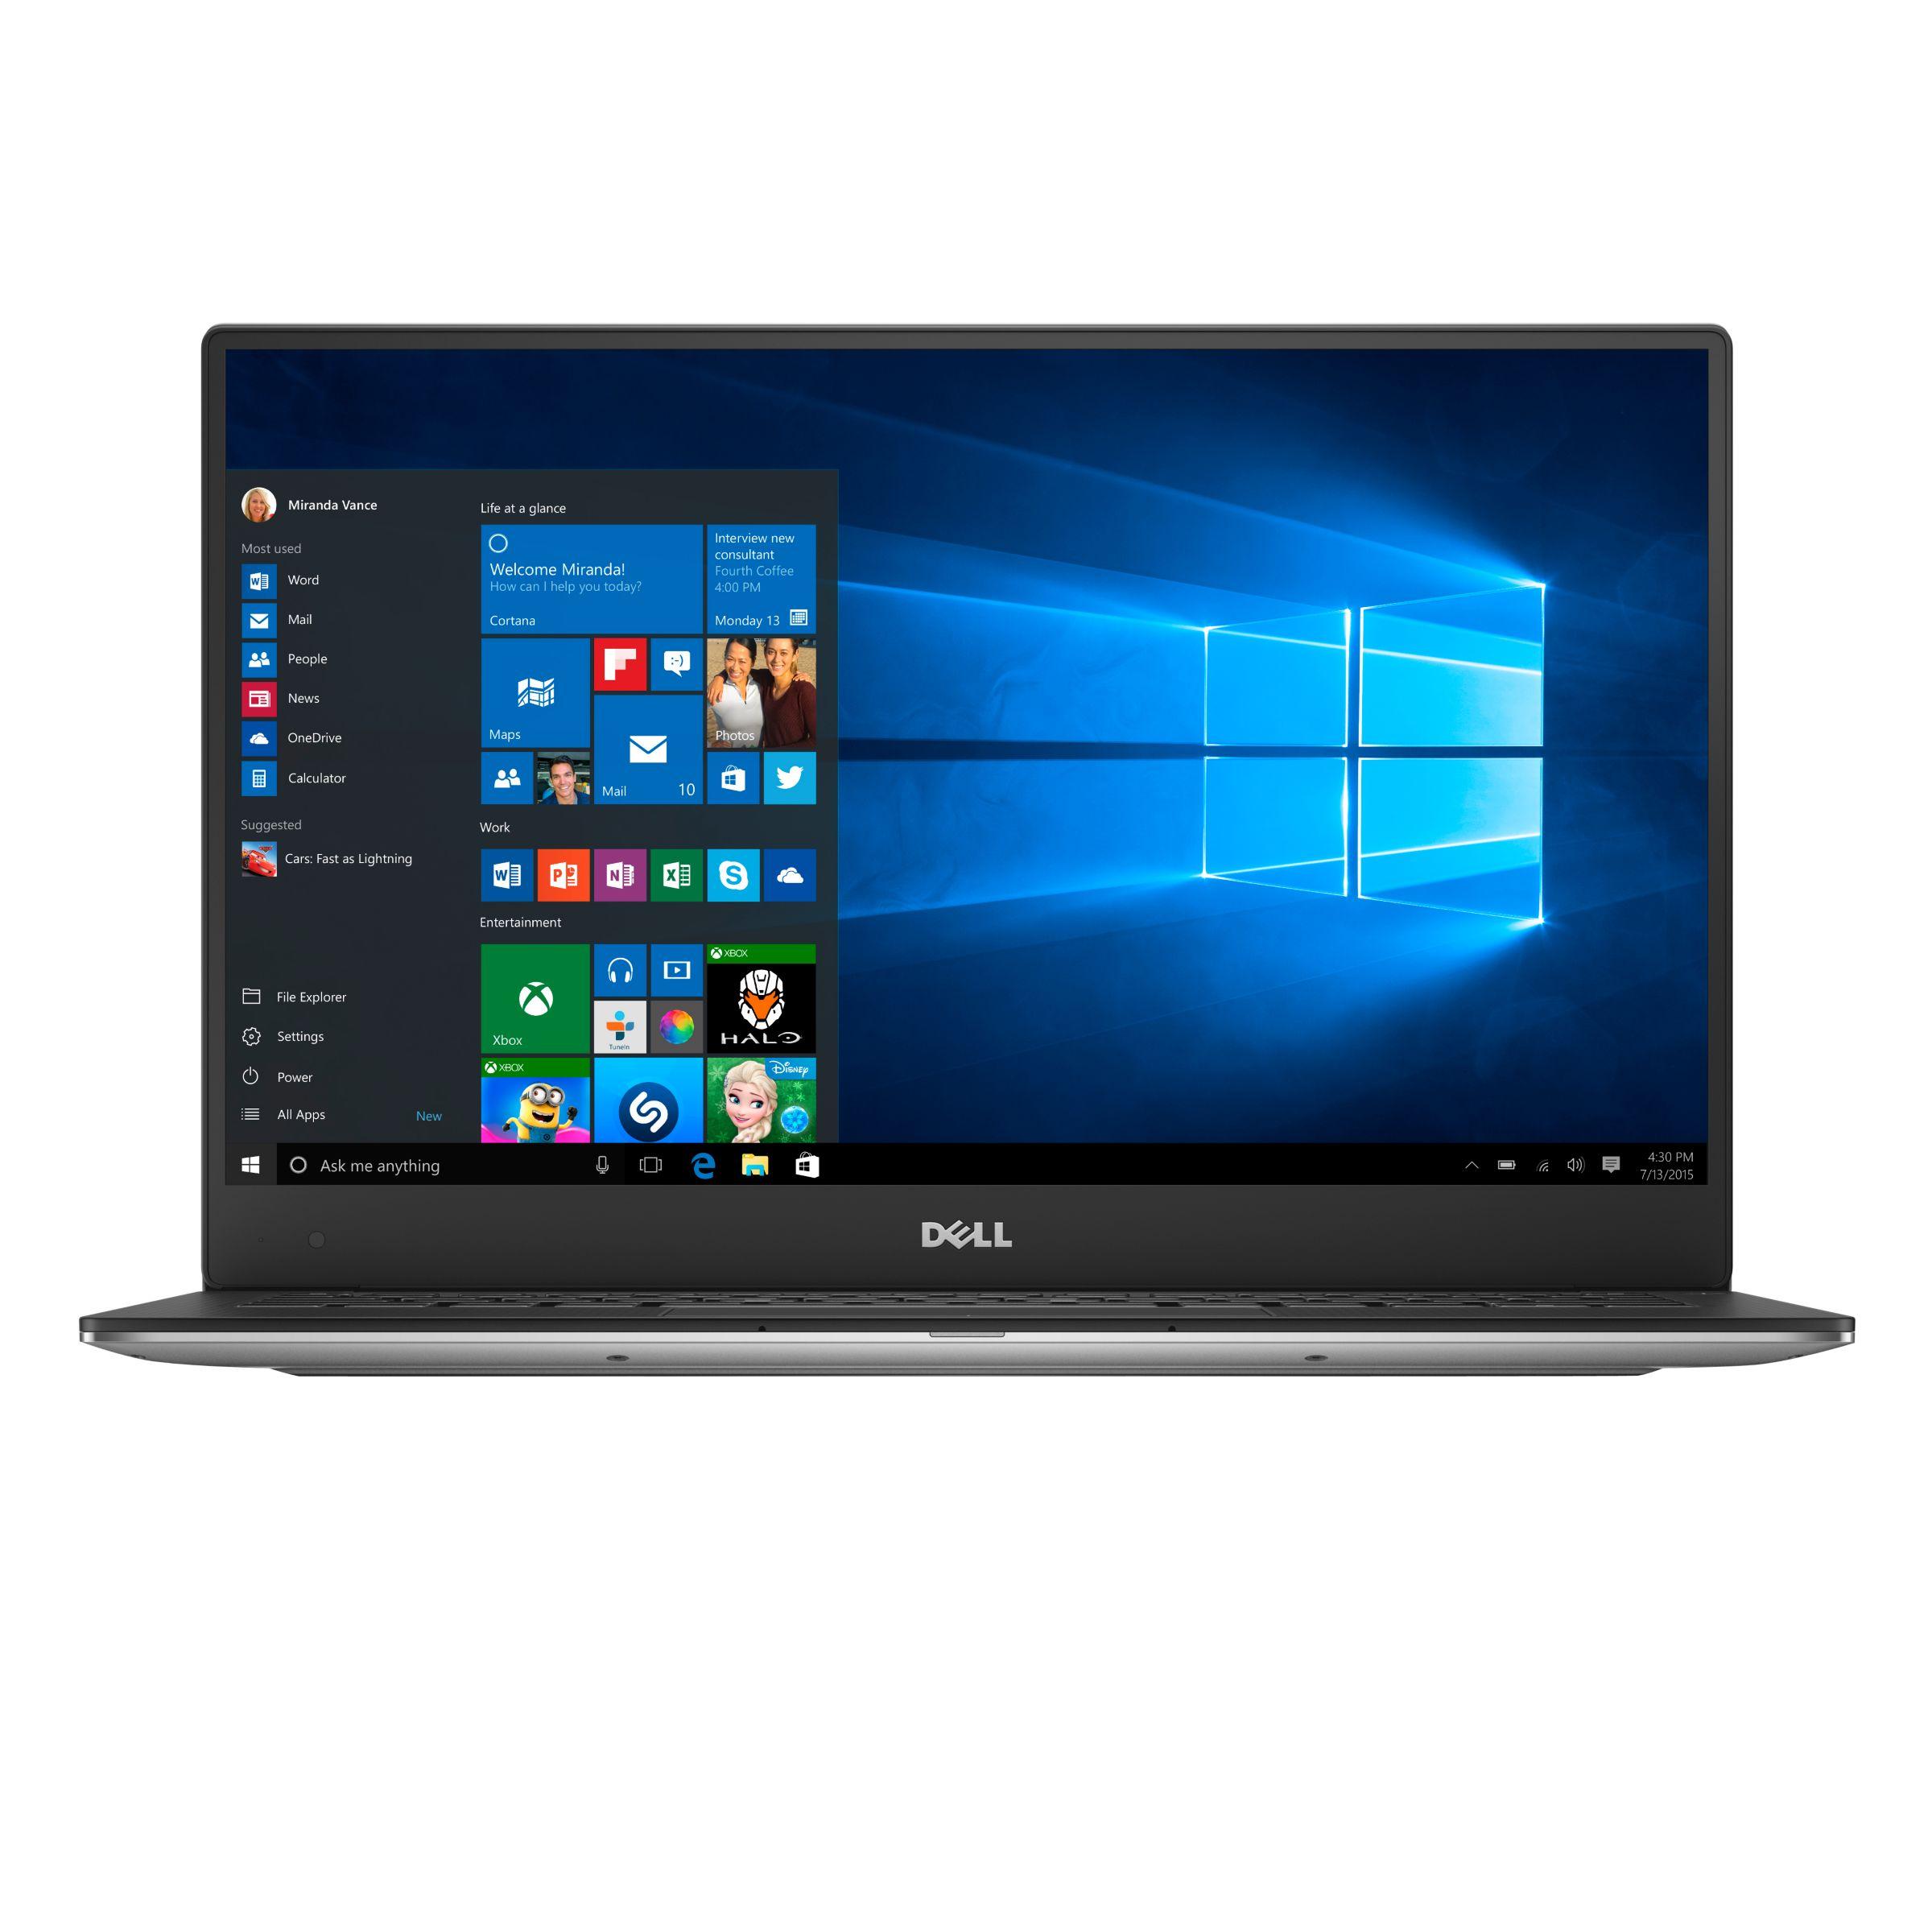 Dell Xps 13 Notebook Intel Core I5 8gb Ram 256gb Ssd Full Hd 13 3 Screen 7th Gen Silver At John Lewis Partners